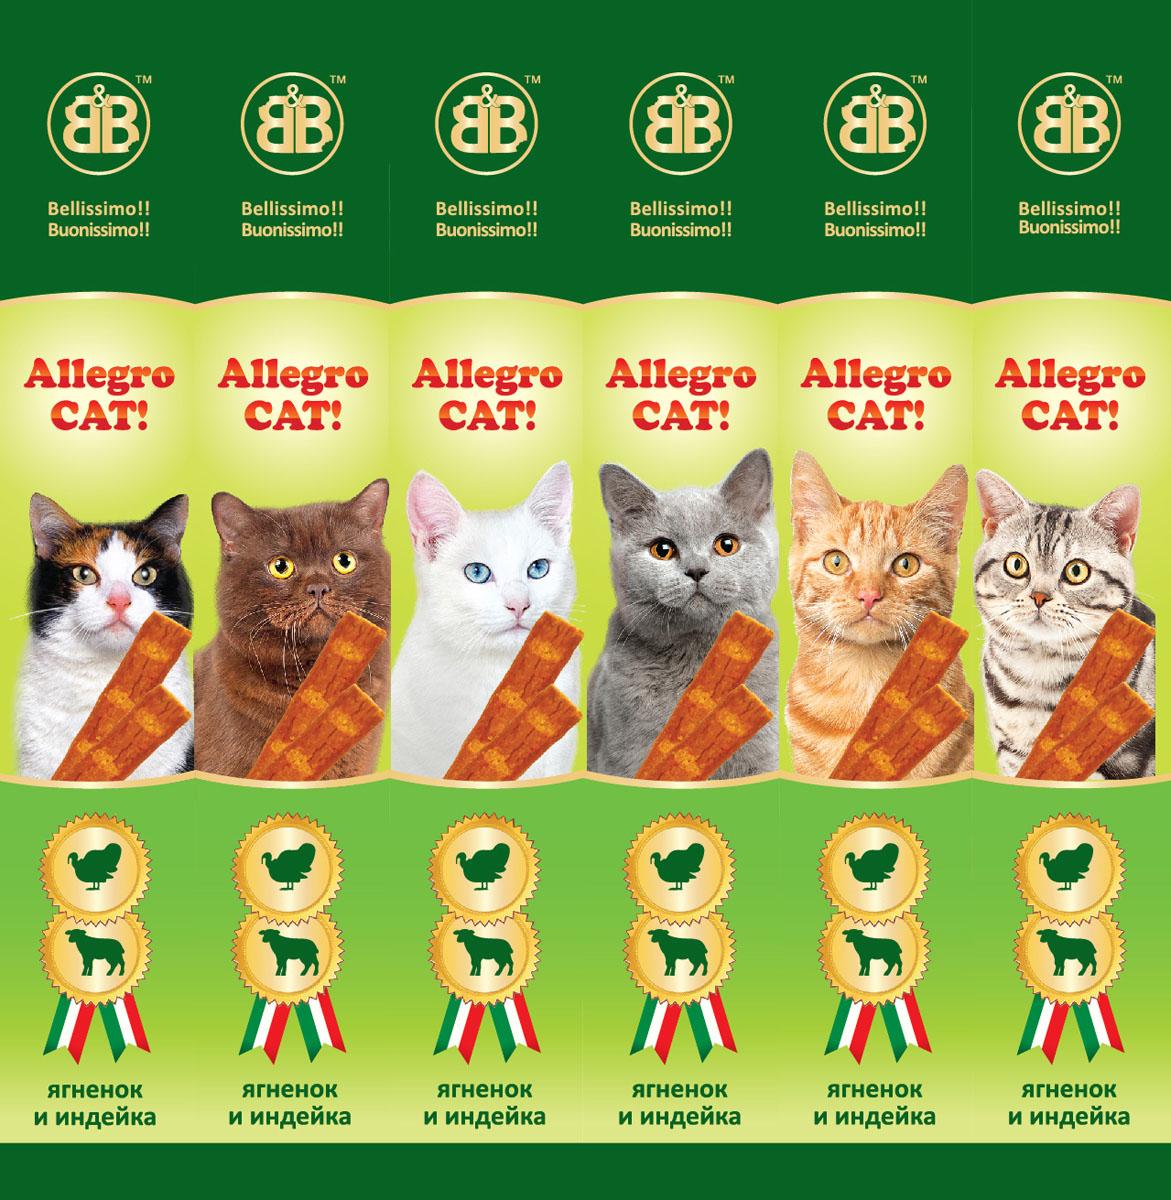 лакомство b&b allegro cat колбаски курица печень для кошек 6шт 36450 Лакомство для кошек B&B Allegro Cat, мясные колбаски из ягненка и индейки, 6х5 г